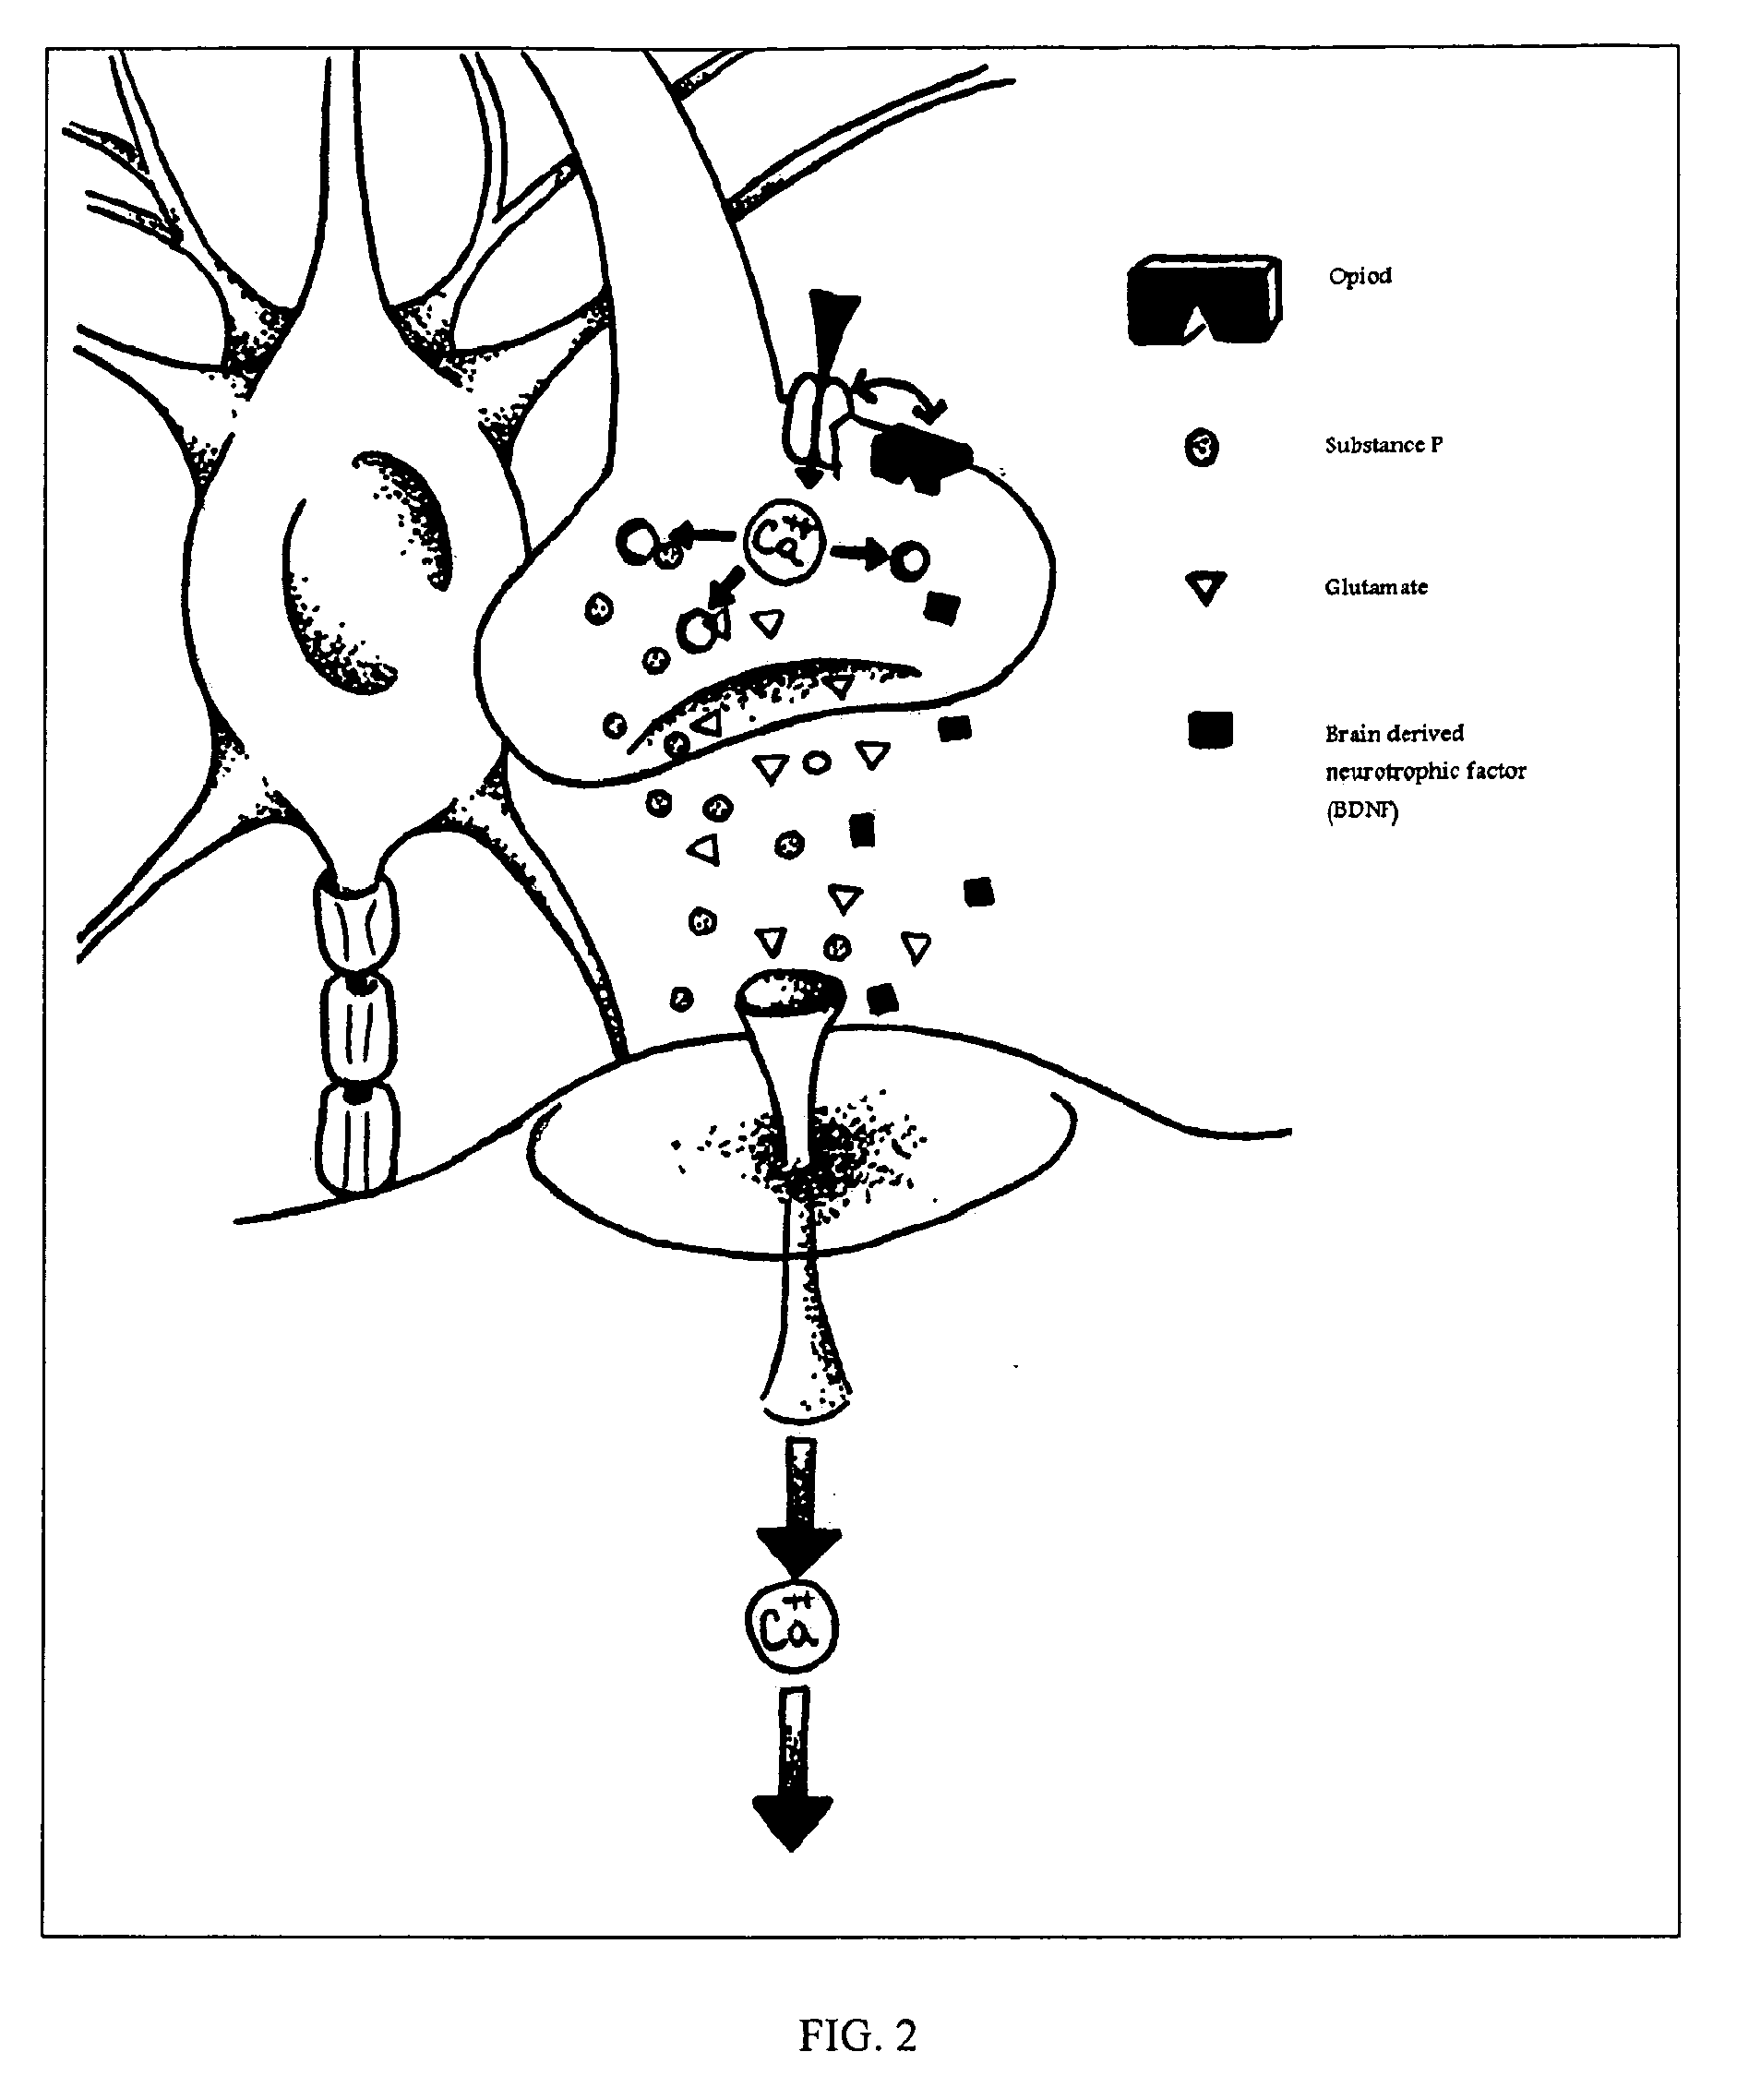 kamagra sildenafil citrate 100mg